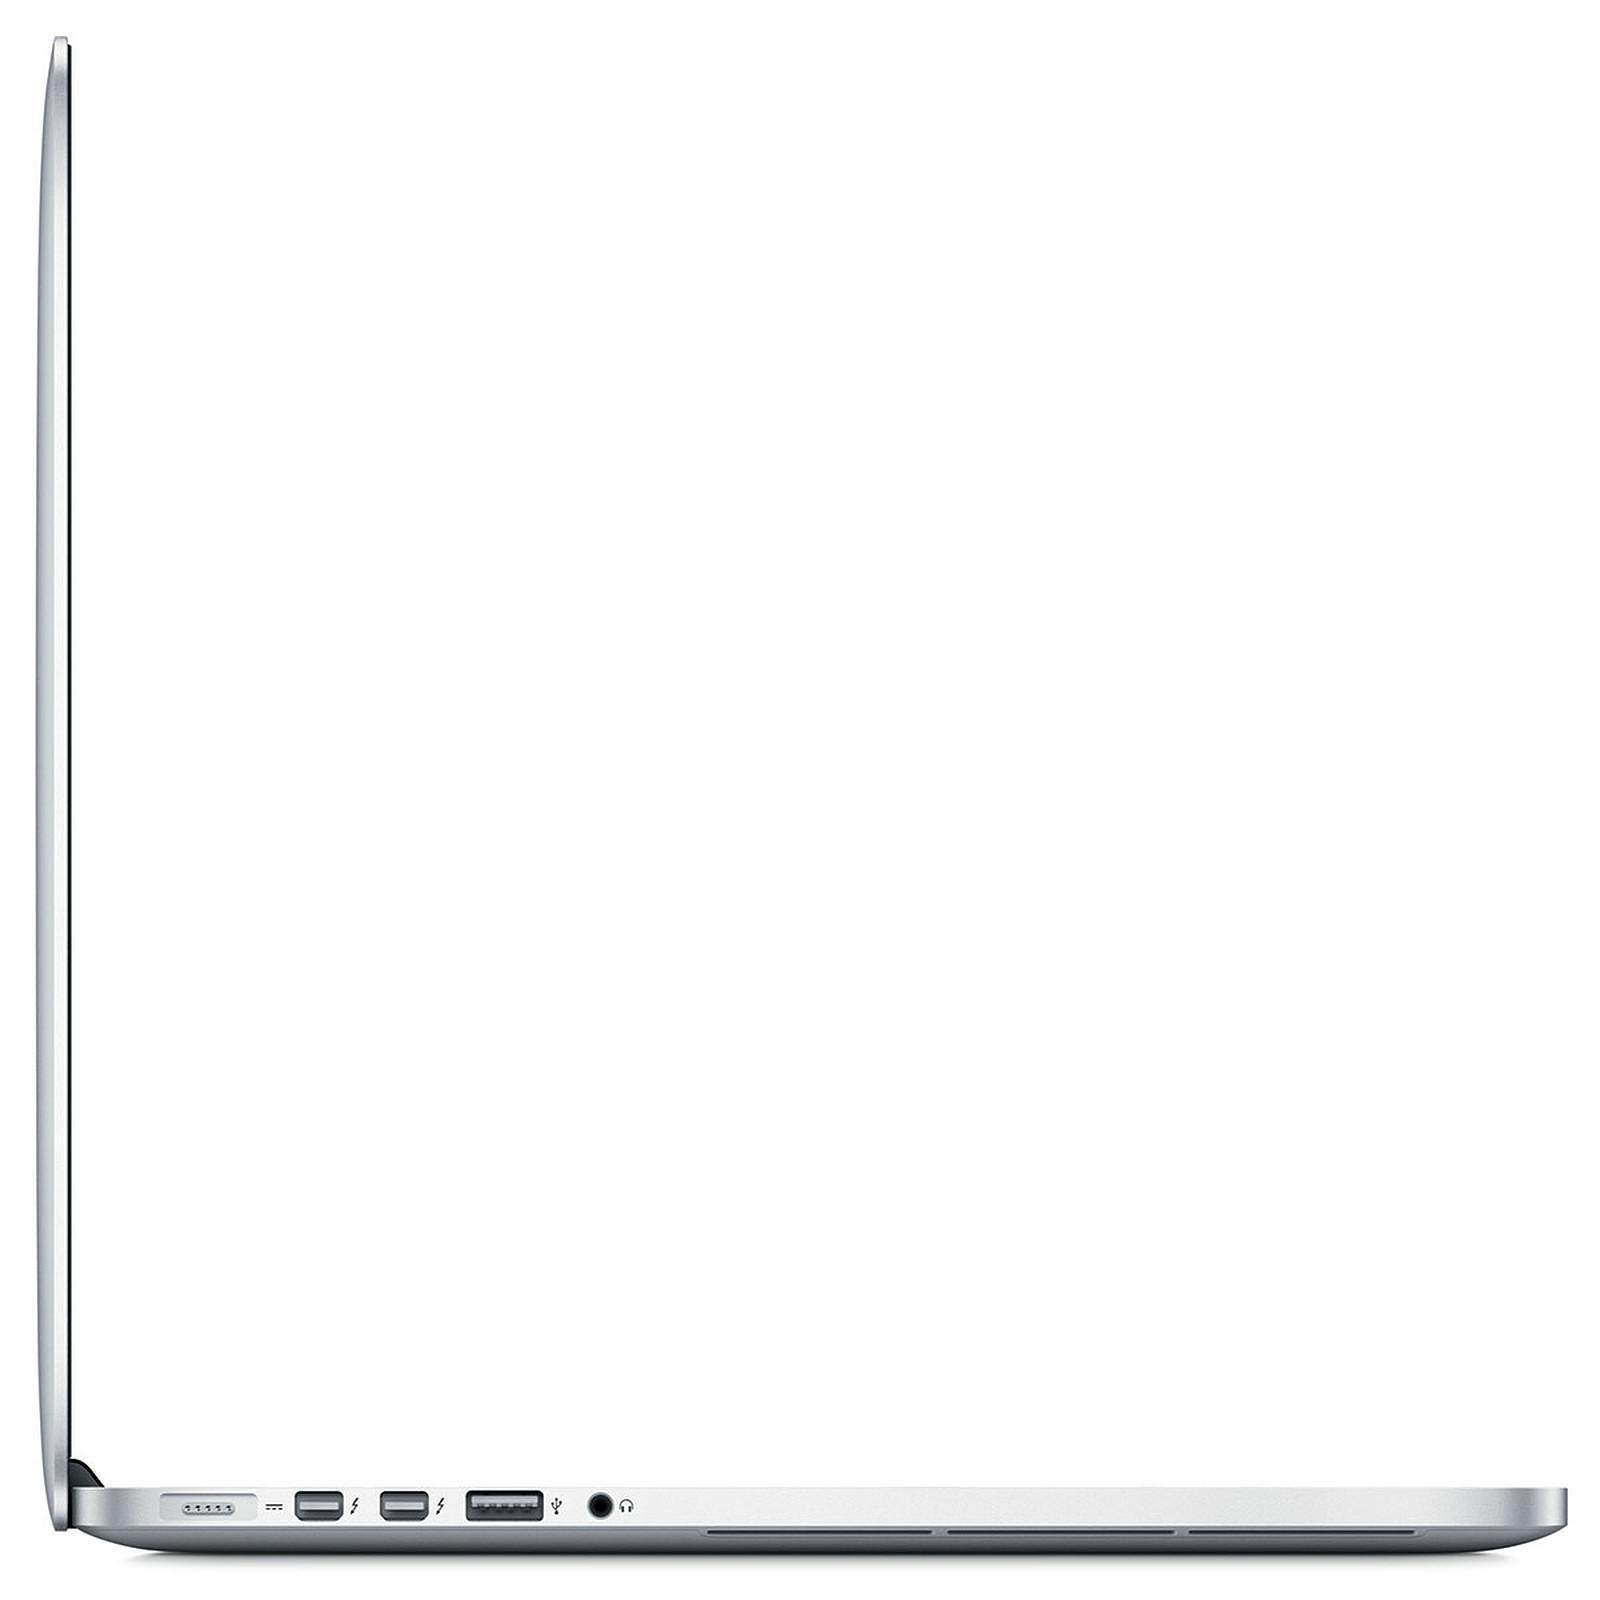 MacBook Pro Retina 15.4-inch (2013) - Core i7 - 8GB - SSD 512 GB AZERTY - French